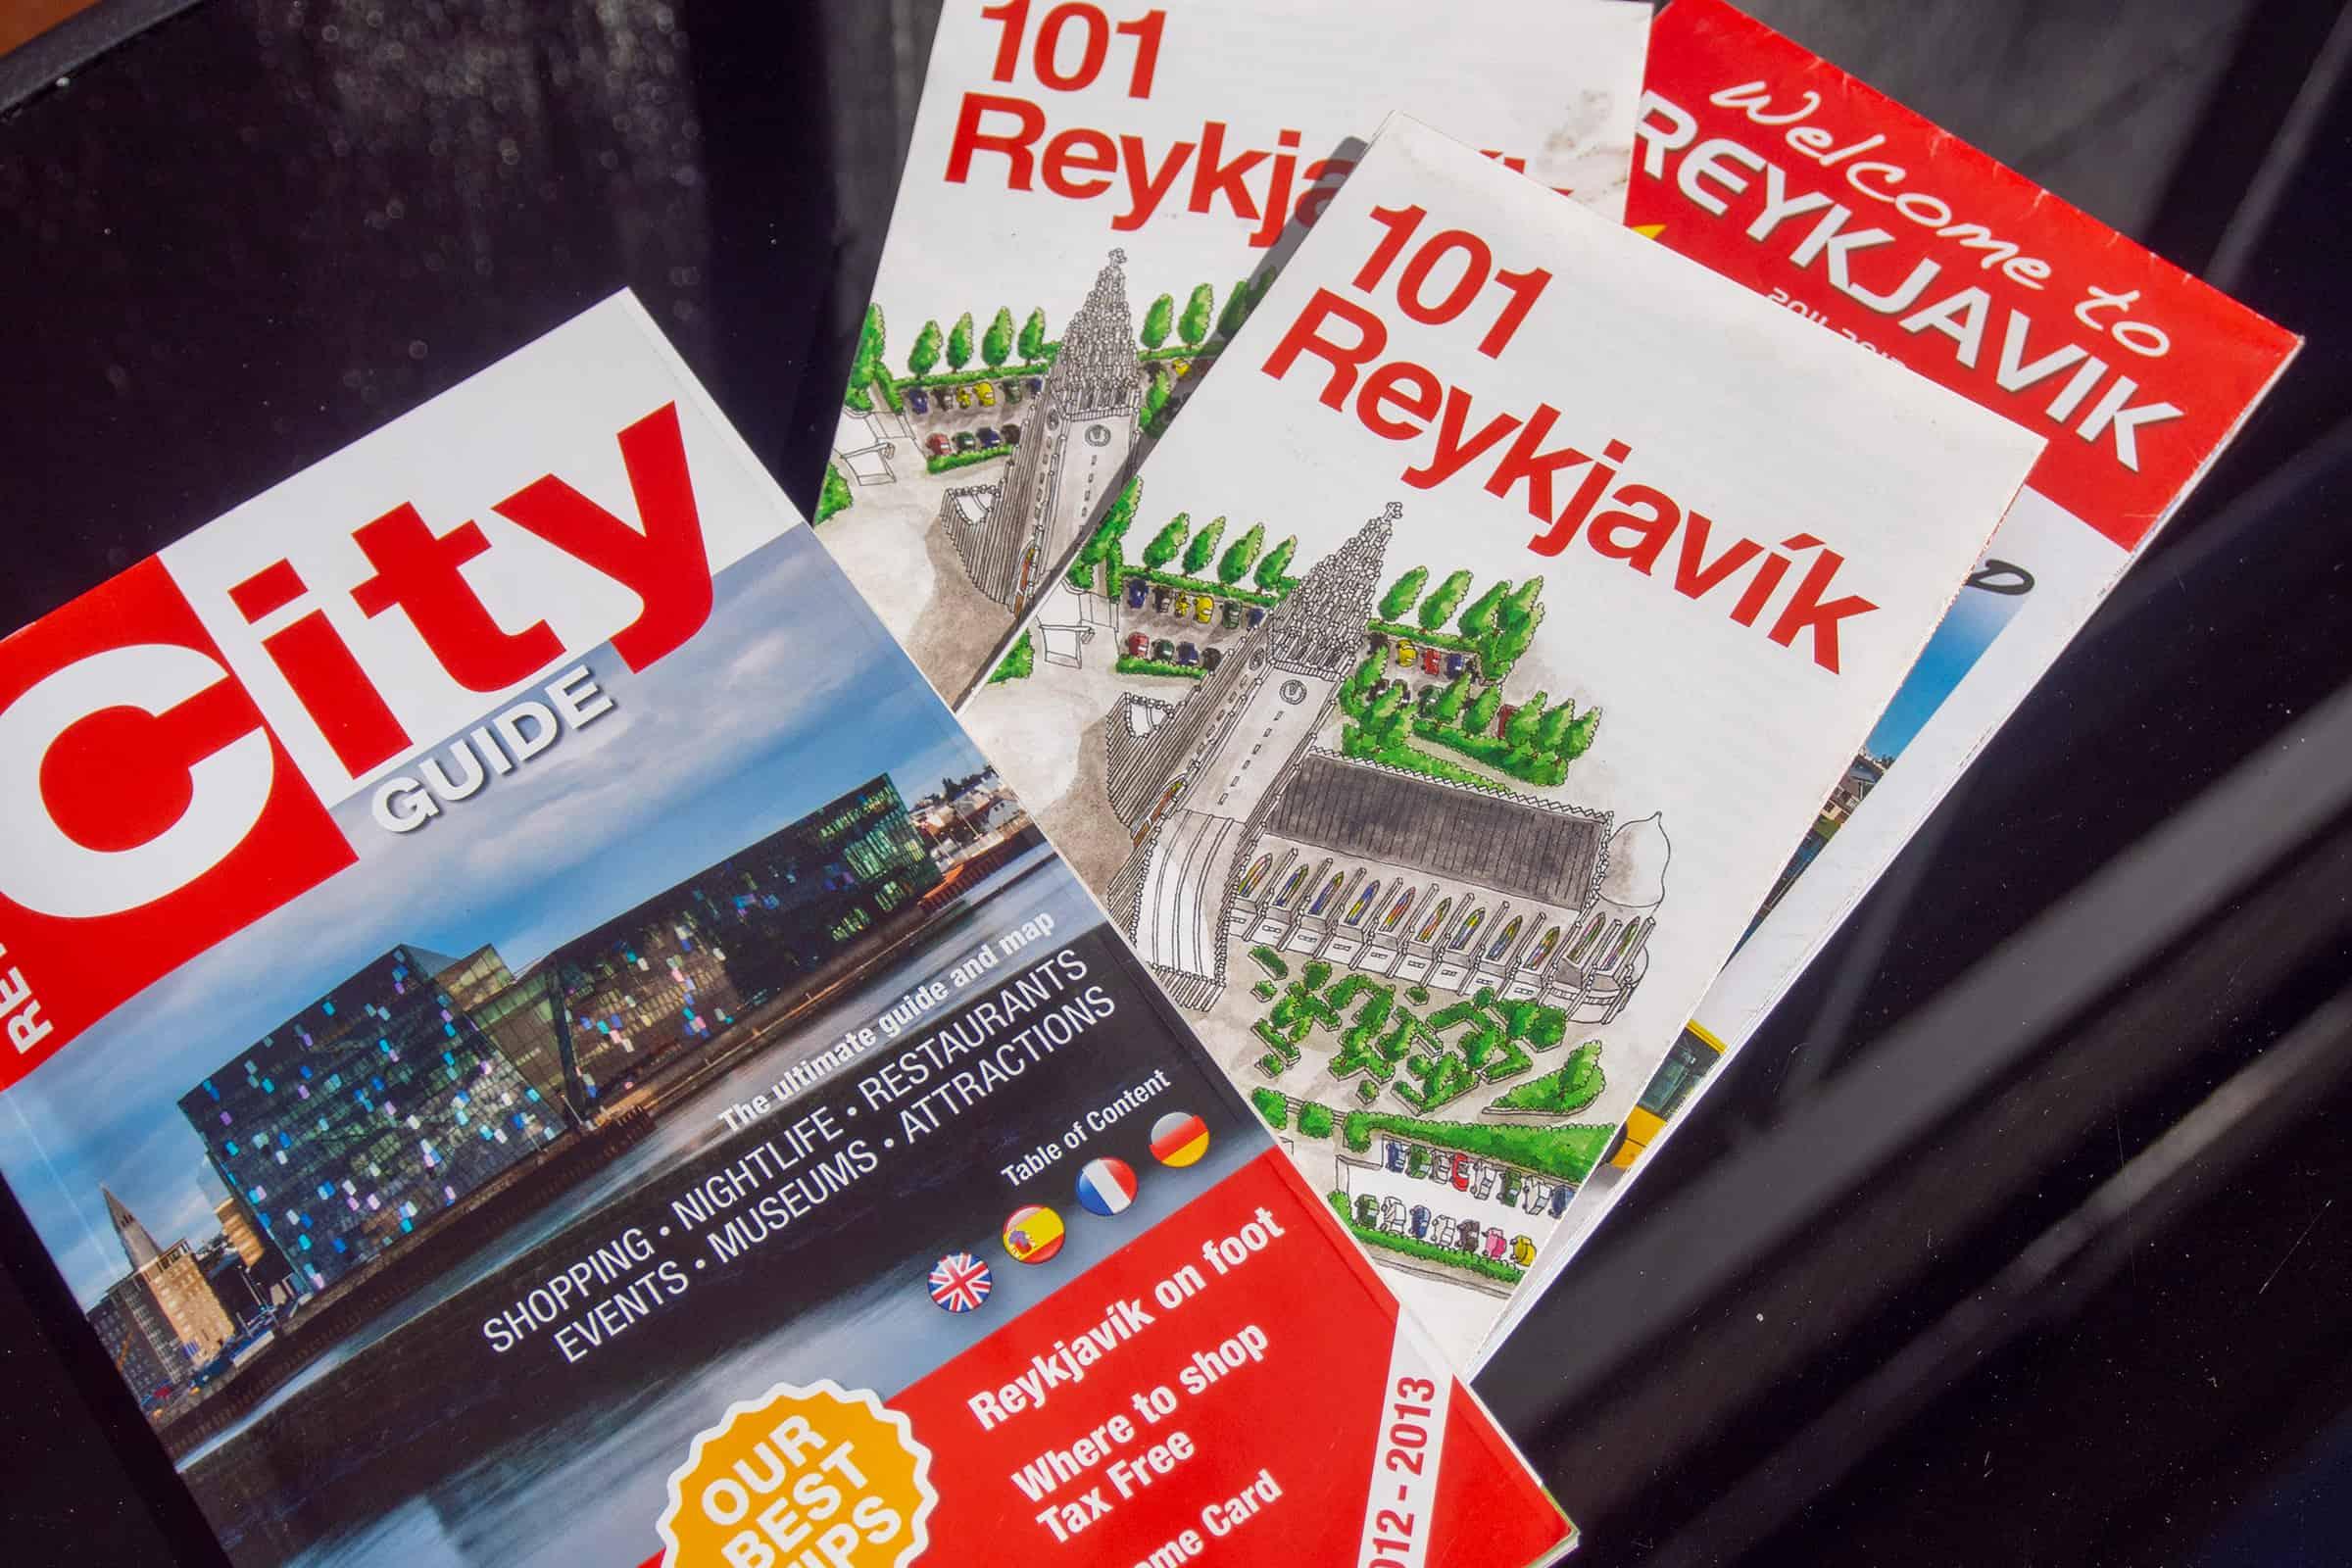 City Guide Reykjavik